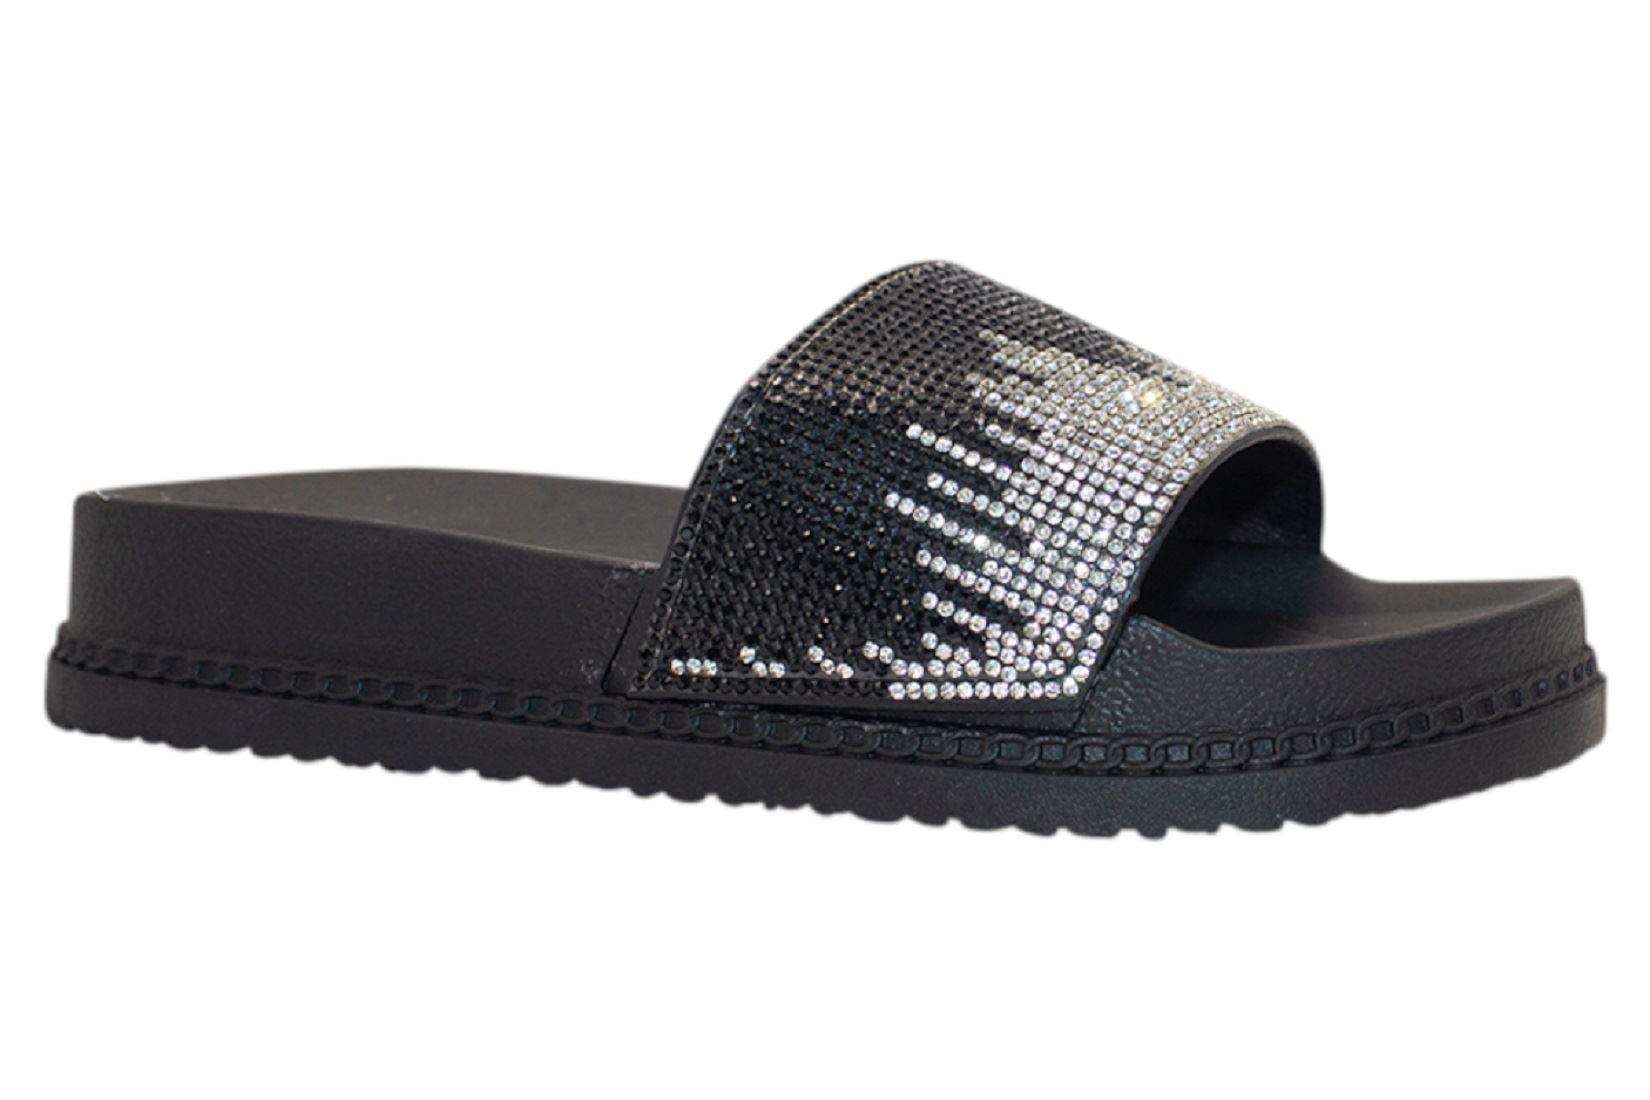 Womens-Sliders-Casual-Slippers-Mules-Ladies-Diamante-Flip-Flop-Sandals-Shoes thumbnail 51